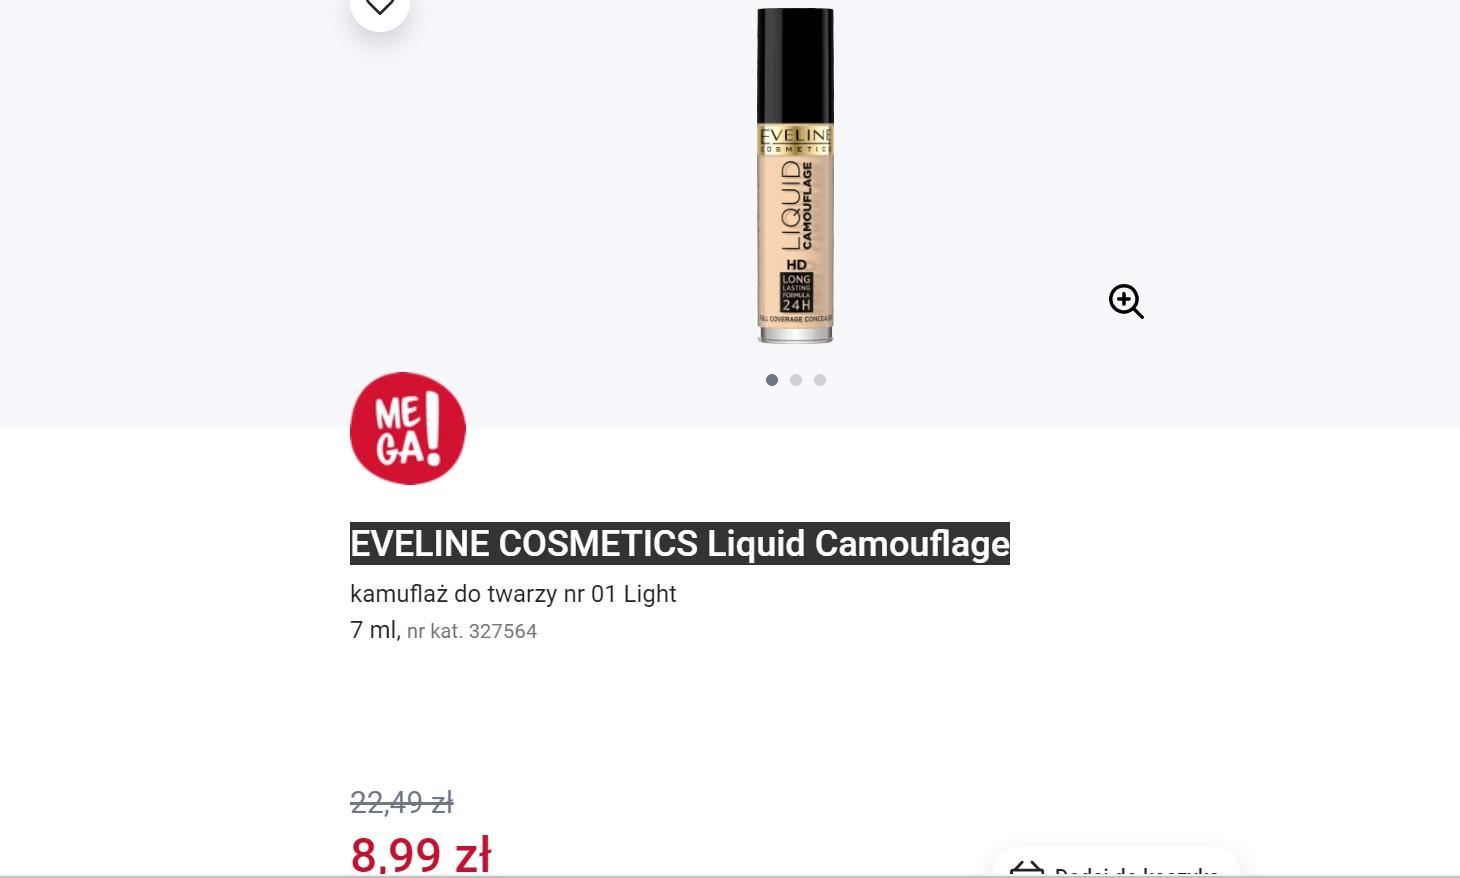 Korektor Eveline Cosmetics na stronie Rossmanna